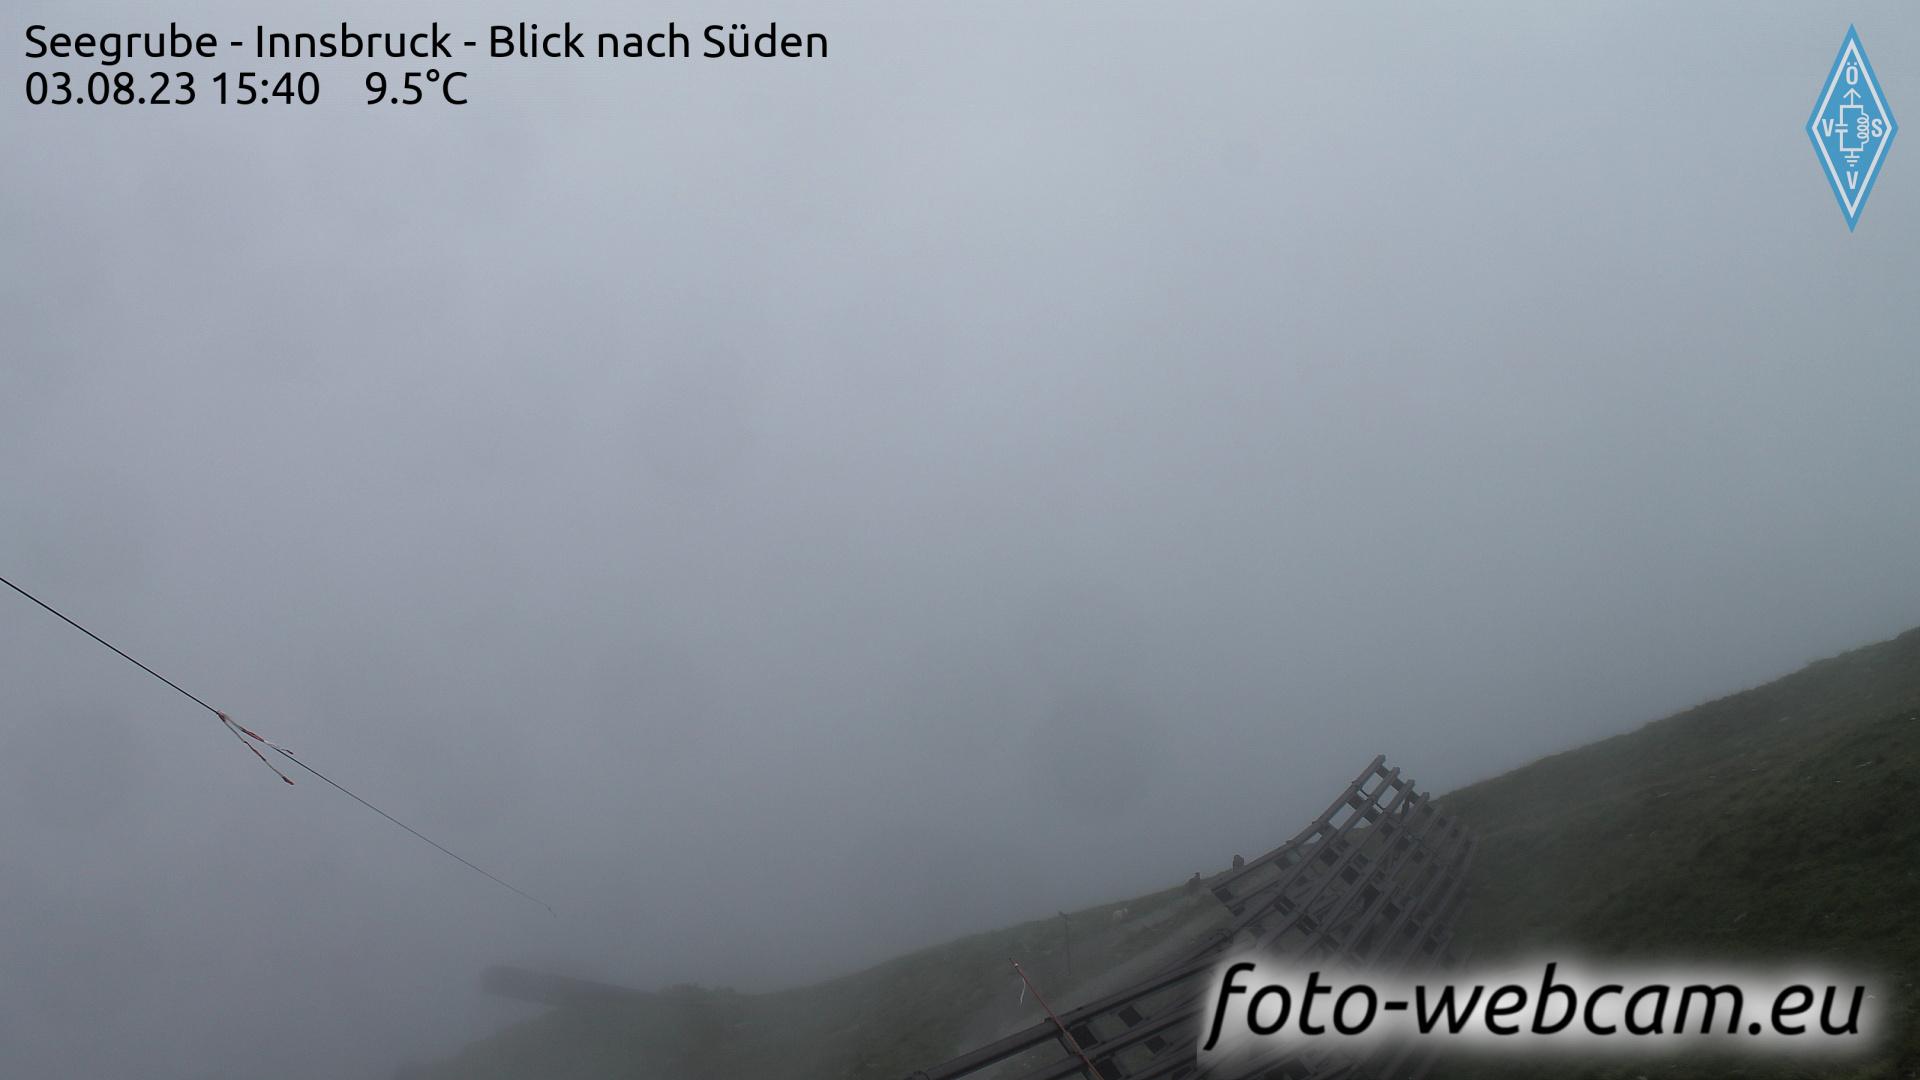 Innsbruck Wed. 15:18